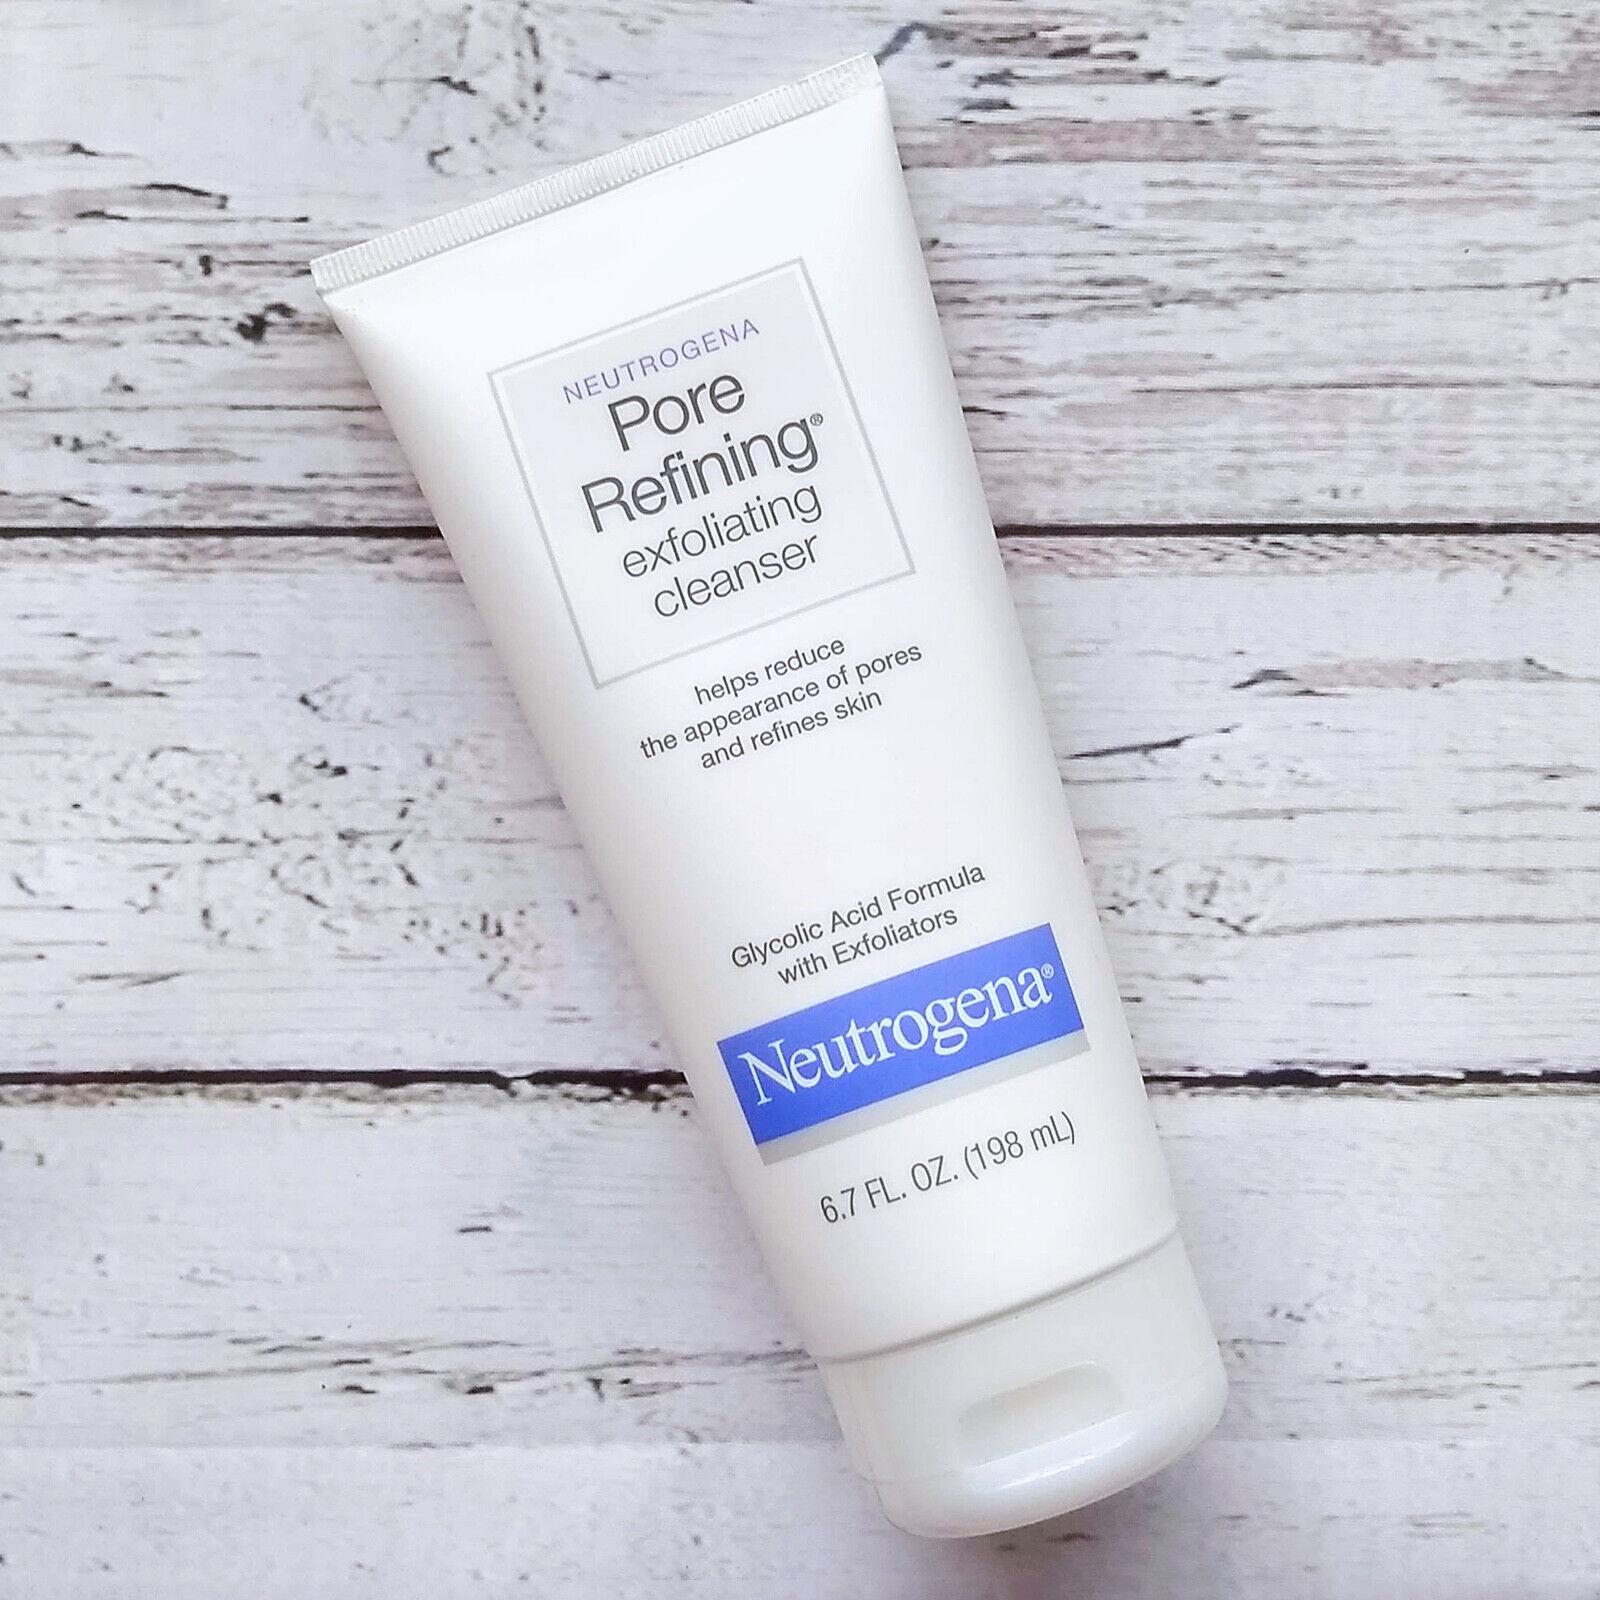 Neutrogena Pore Refining Daily Cleanser 6.7 oz.